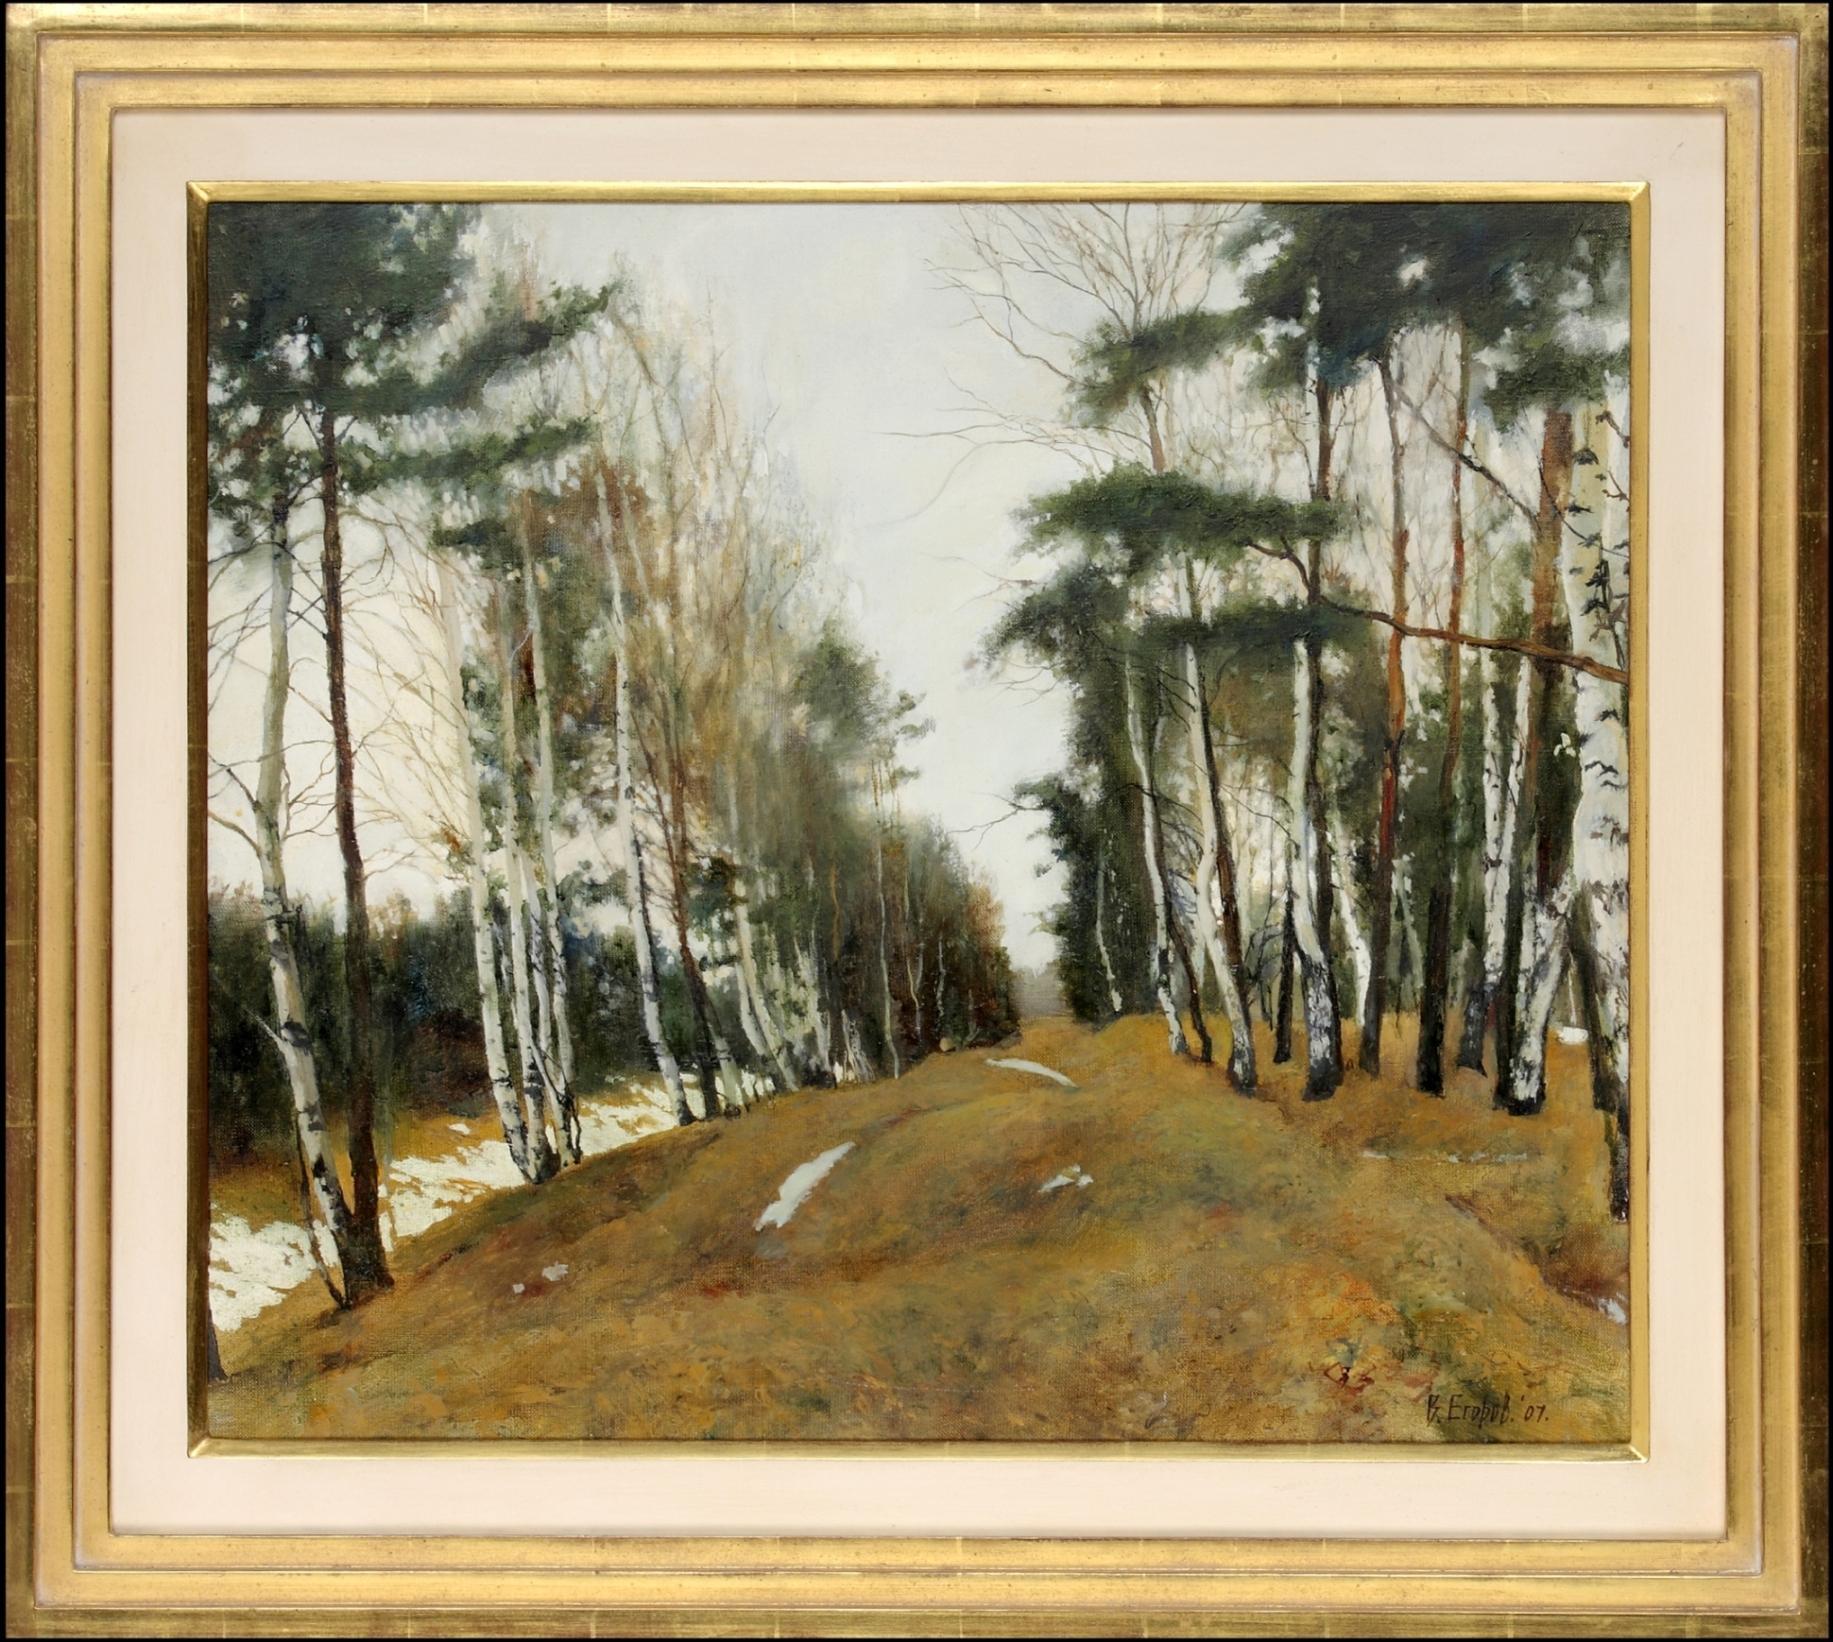 Snow Receding - Victor Egorov, Russian, Landscape, Snow, Woodland, Season, birch